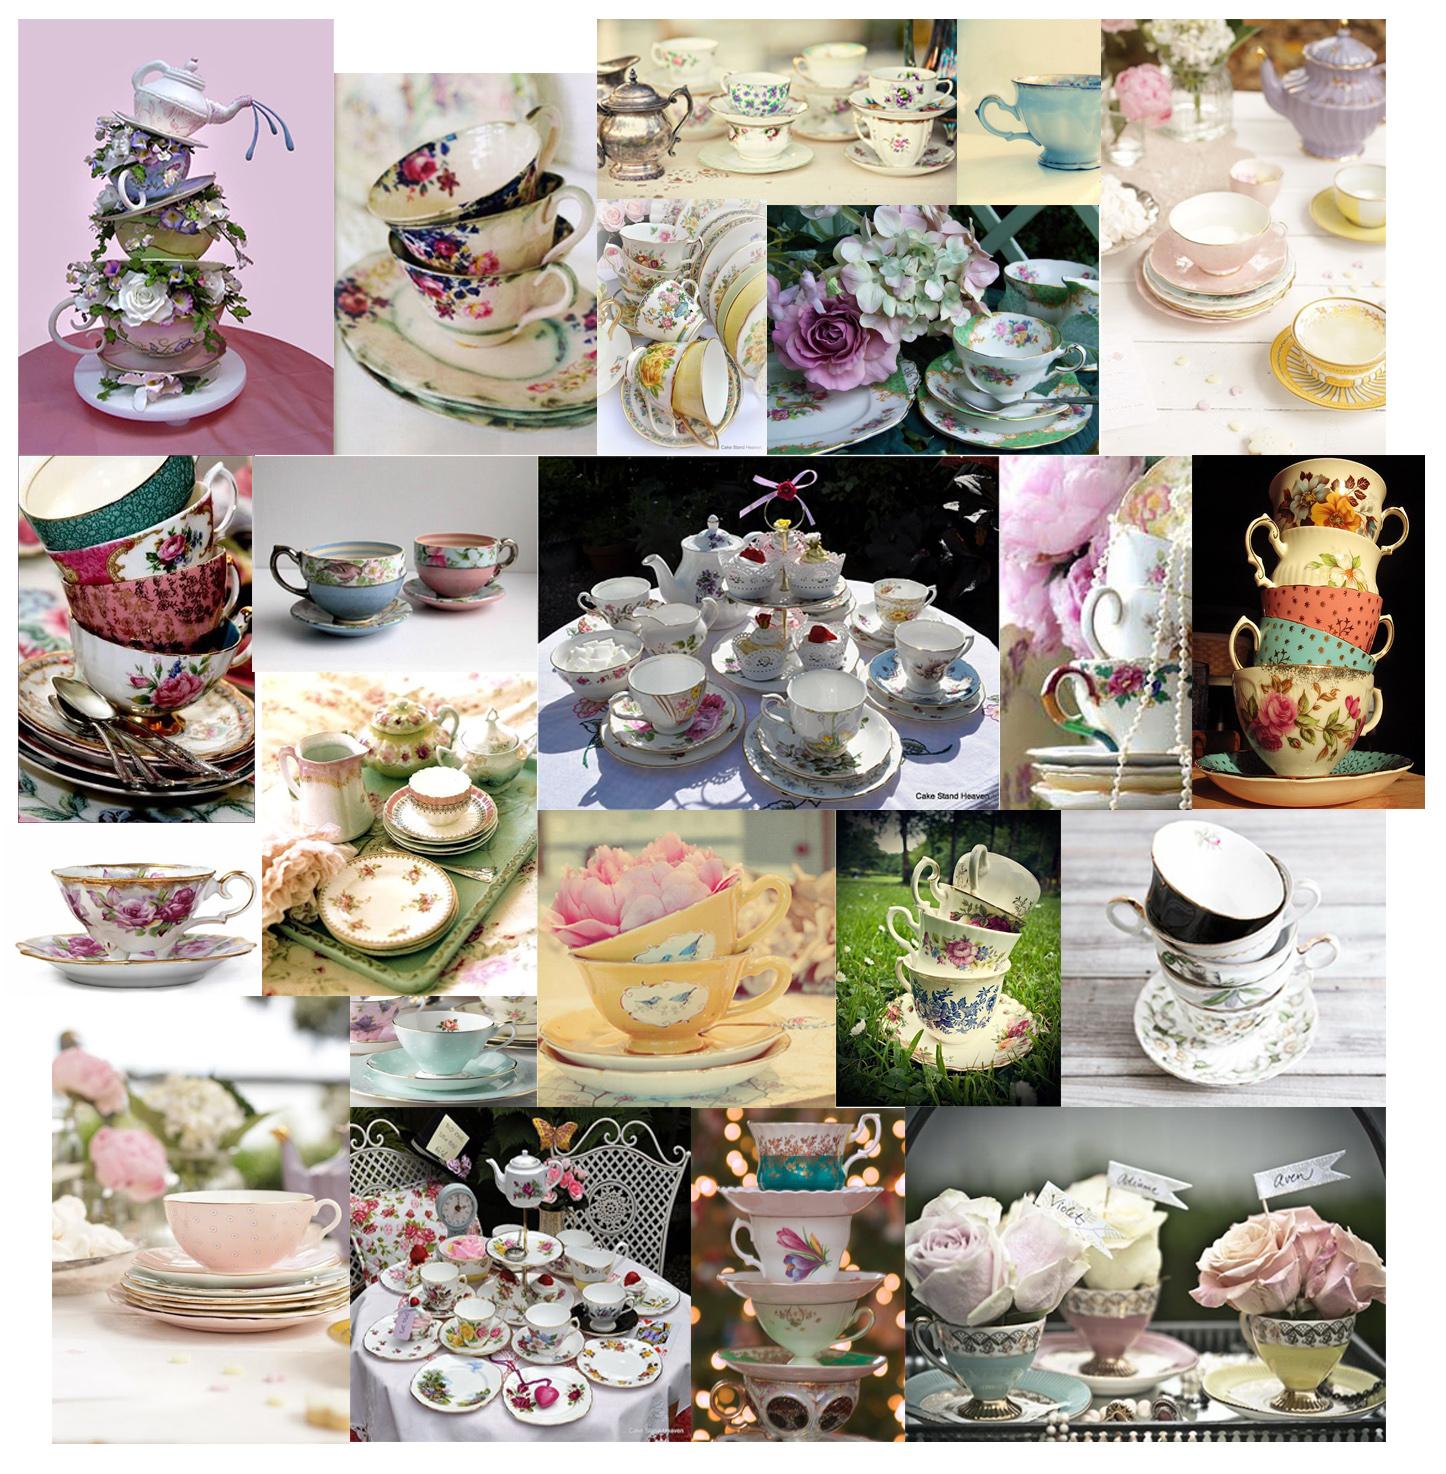 Vintage Tea Party: An Urban Village: VINTAGE TEA PARTY